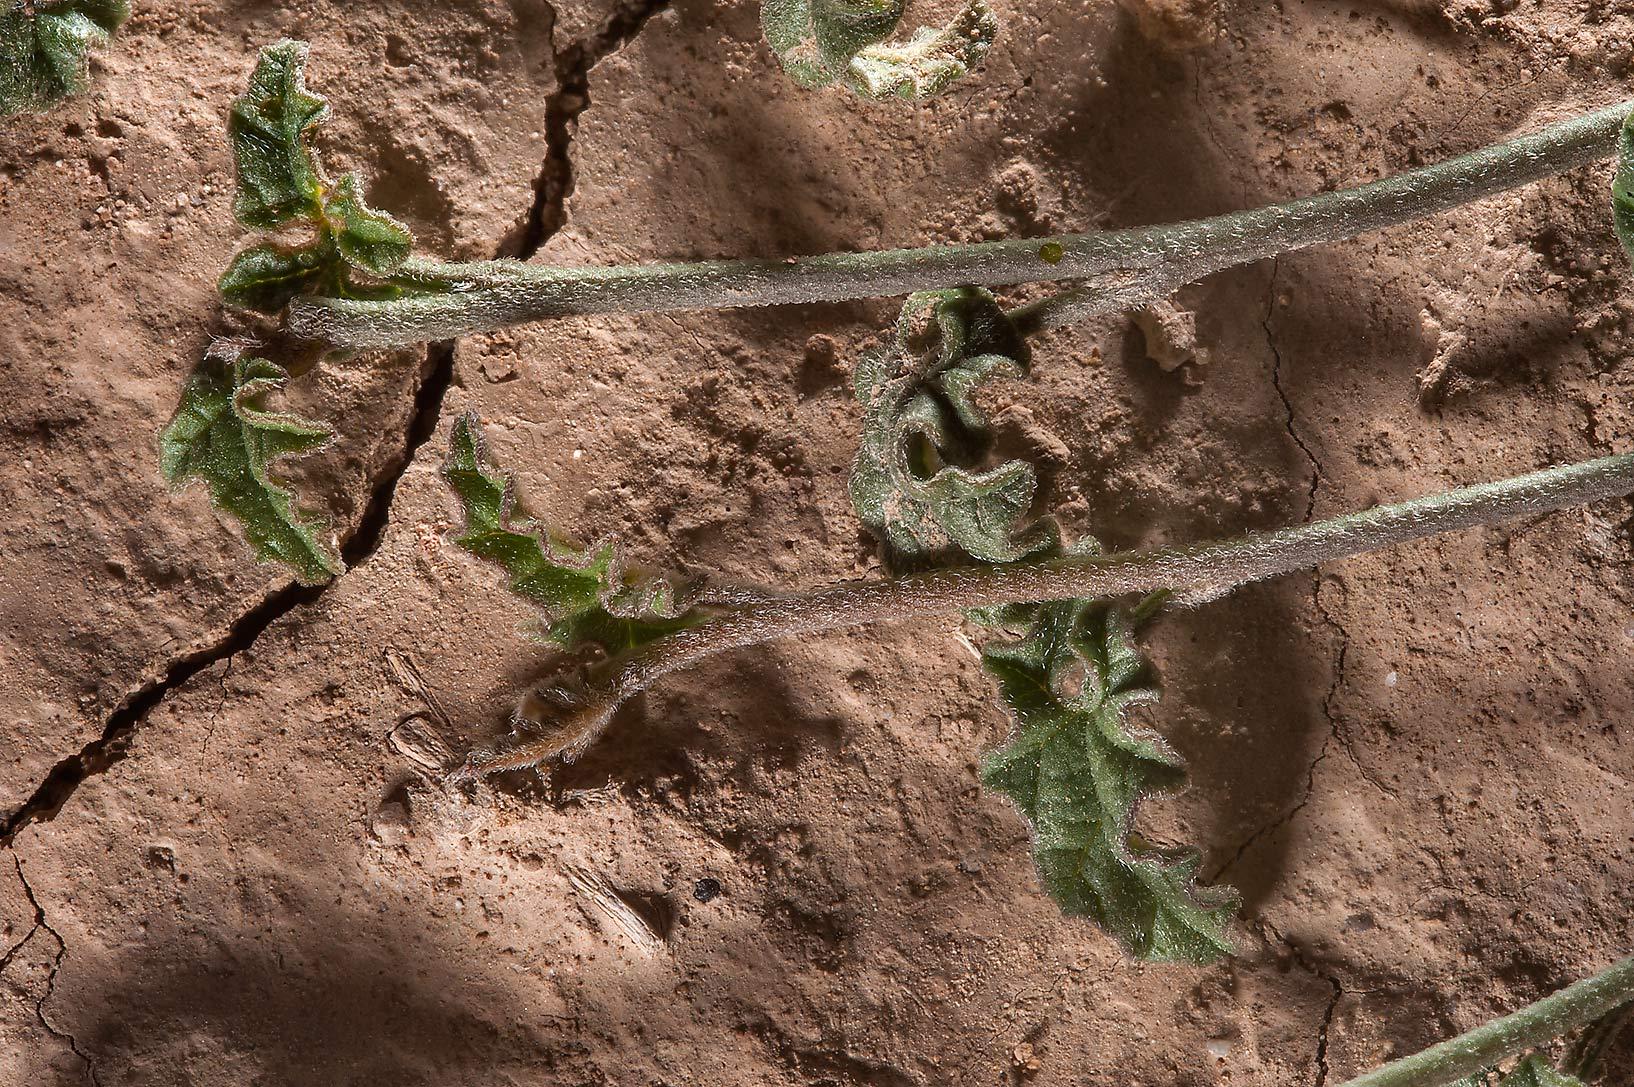 slideshow 154110 close up of shoots of bindweed